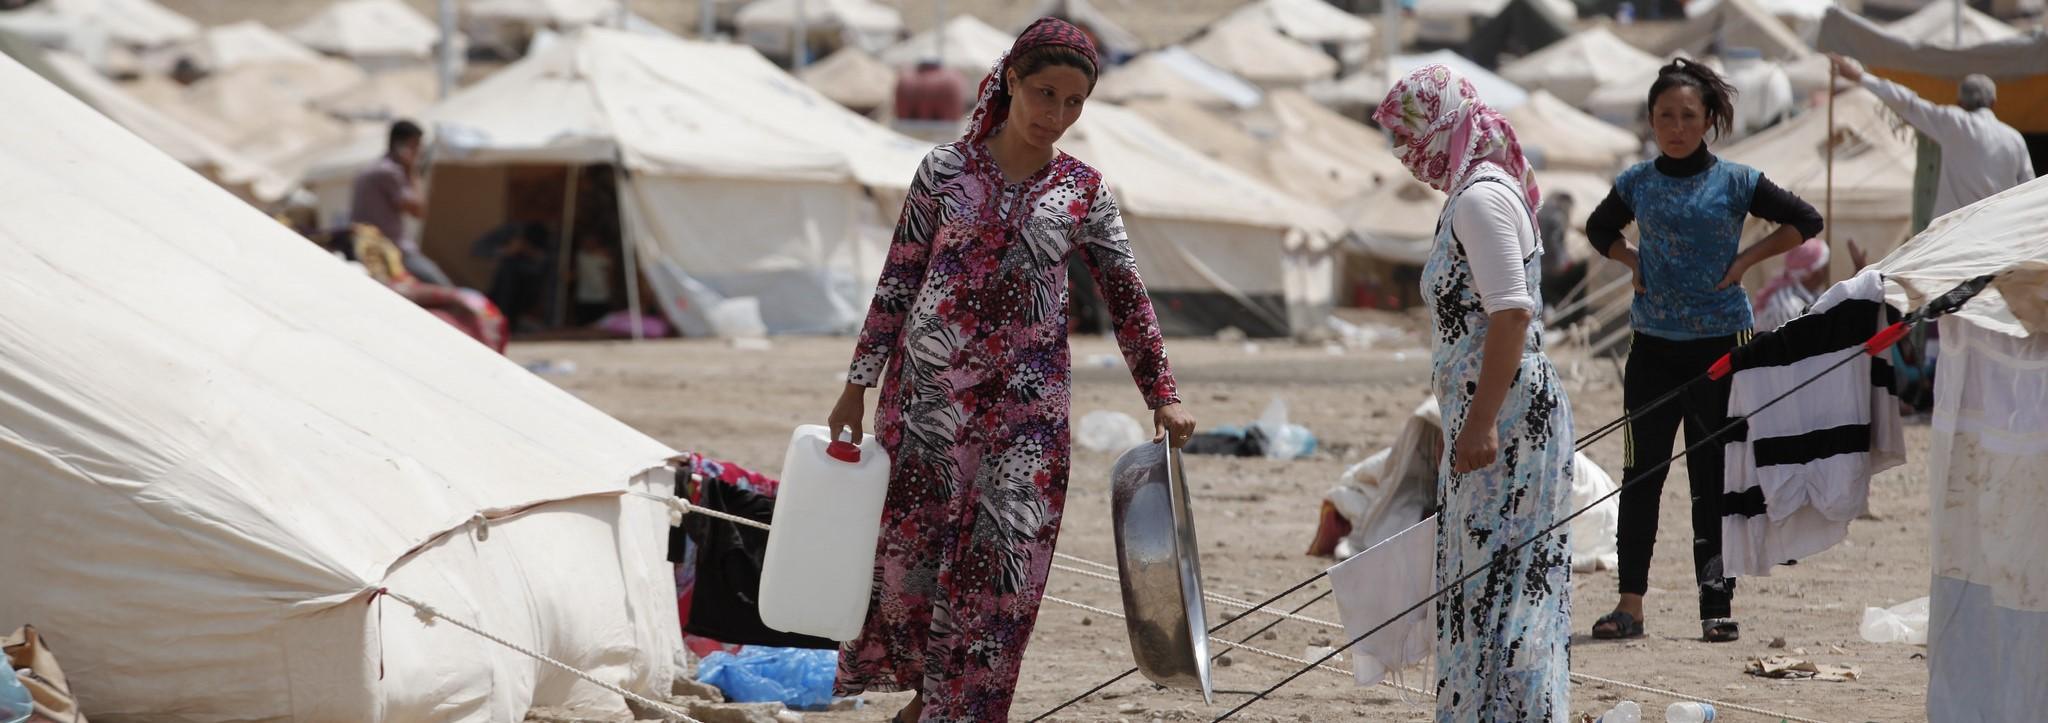 Syrian refugees in a Northern Iraq refugee camp (Photo: Flickr/IHH)